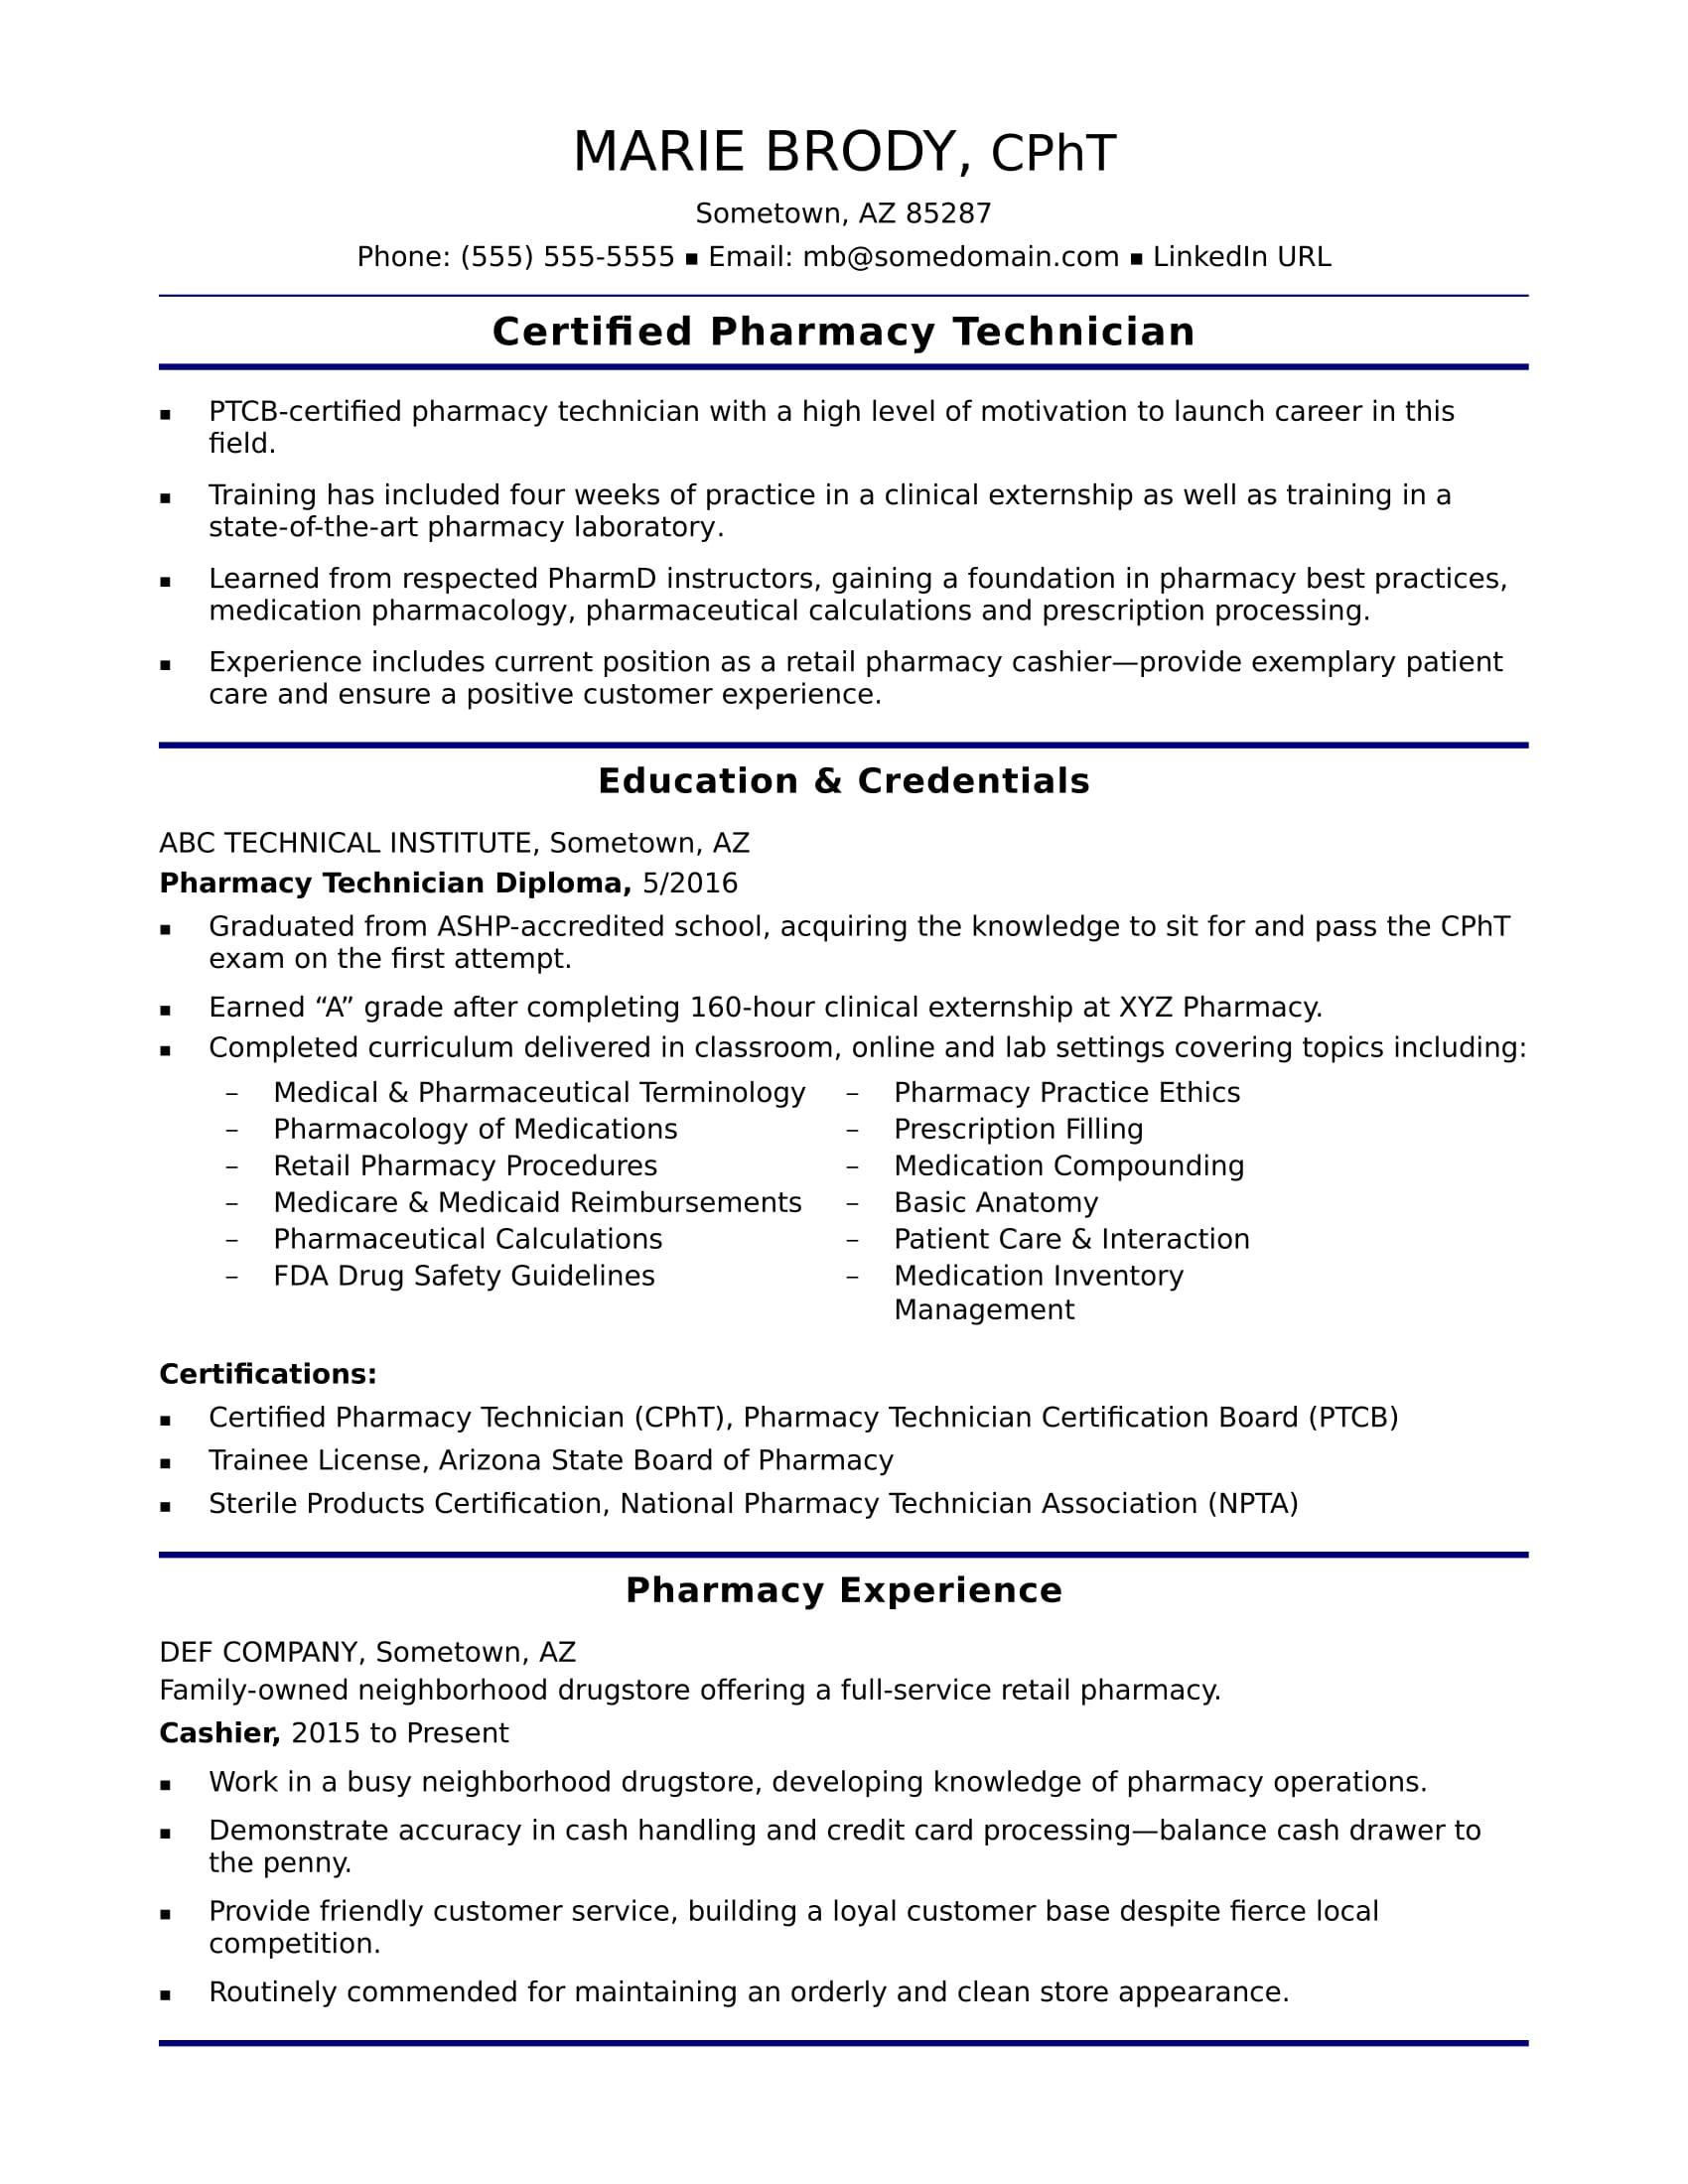 sample of a pharmacy tech summary on resume